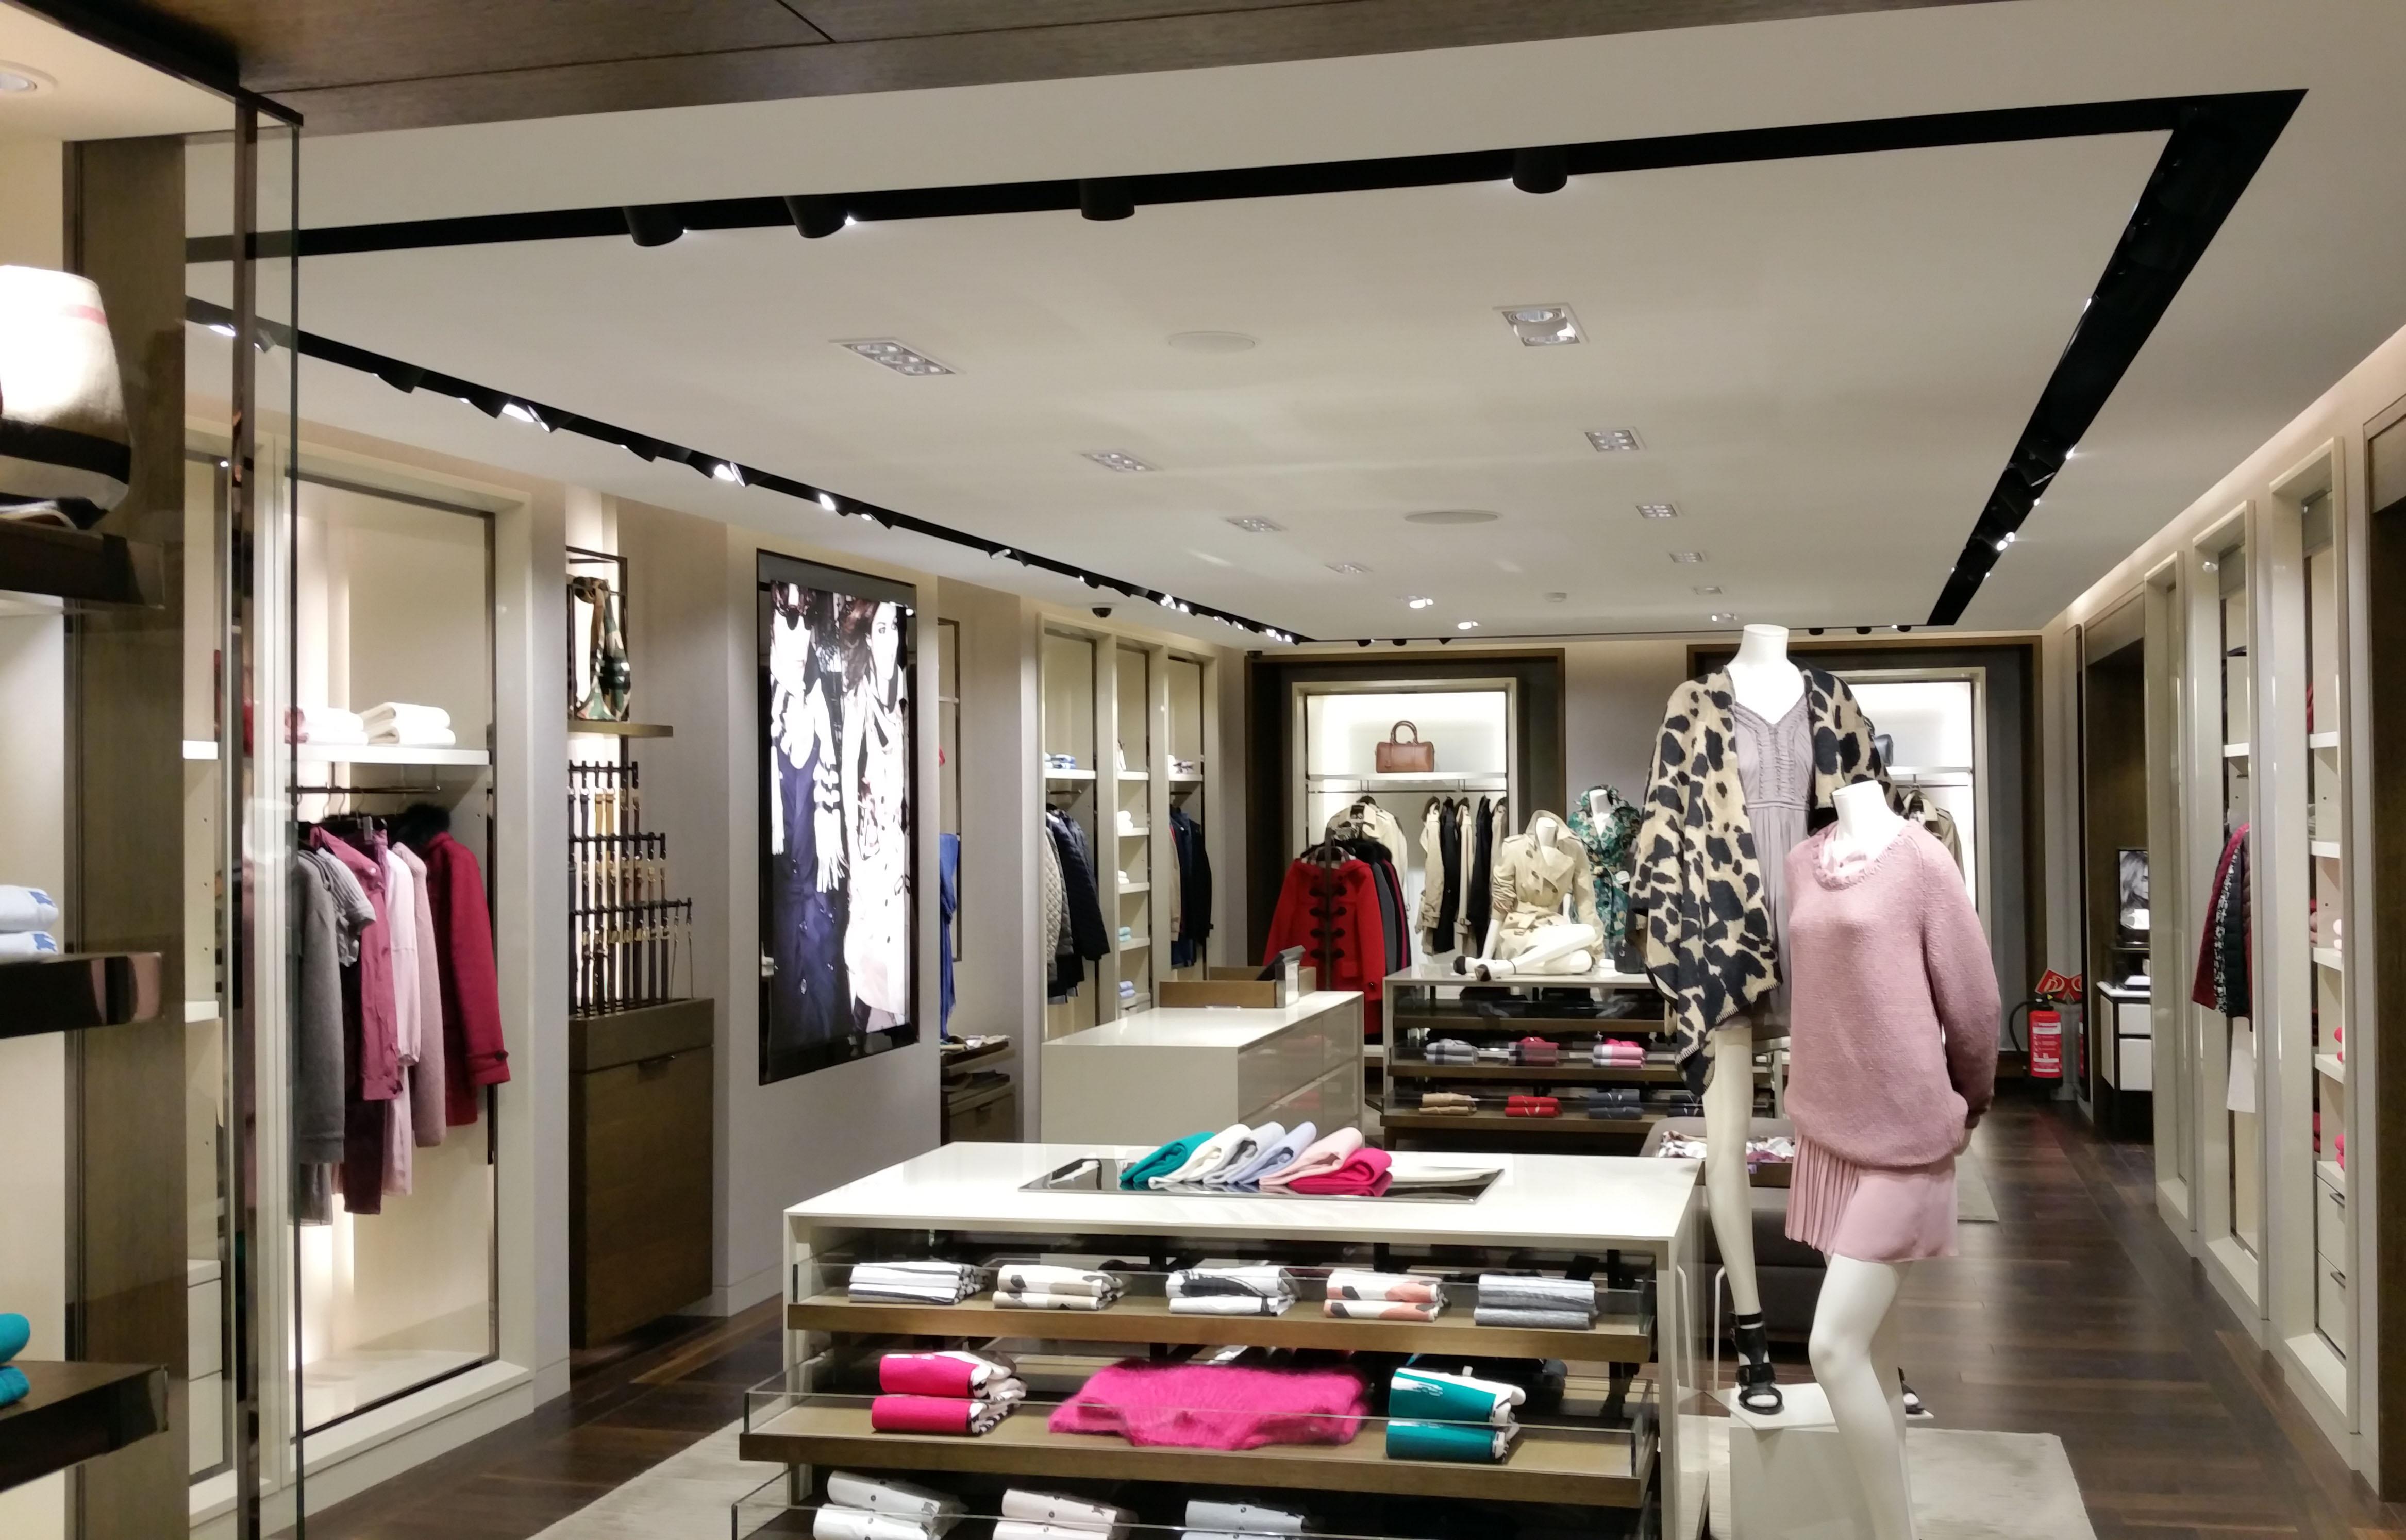 Beleuchtung Shop   Farbechte Led Beleuchtung Fur Shops Und Hotels Campinginfo24 De